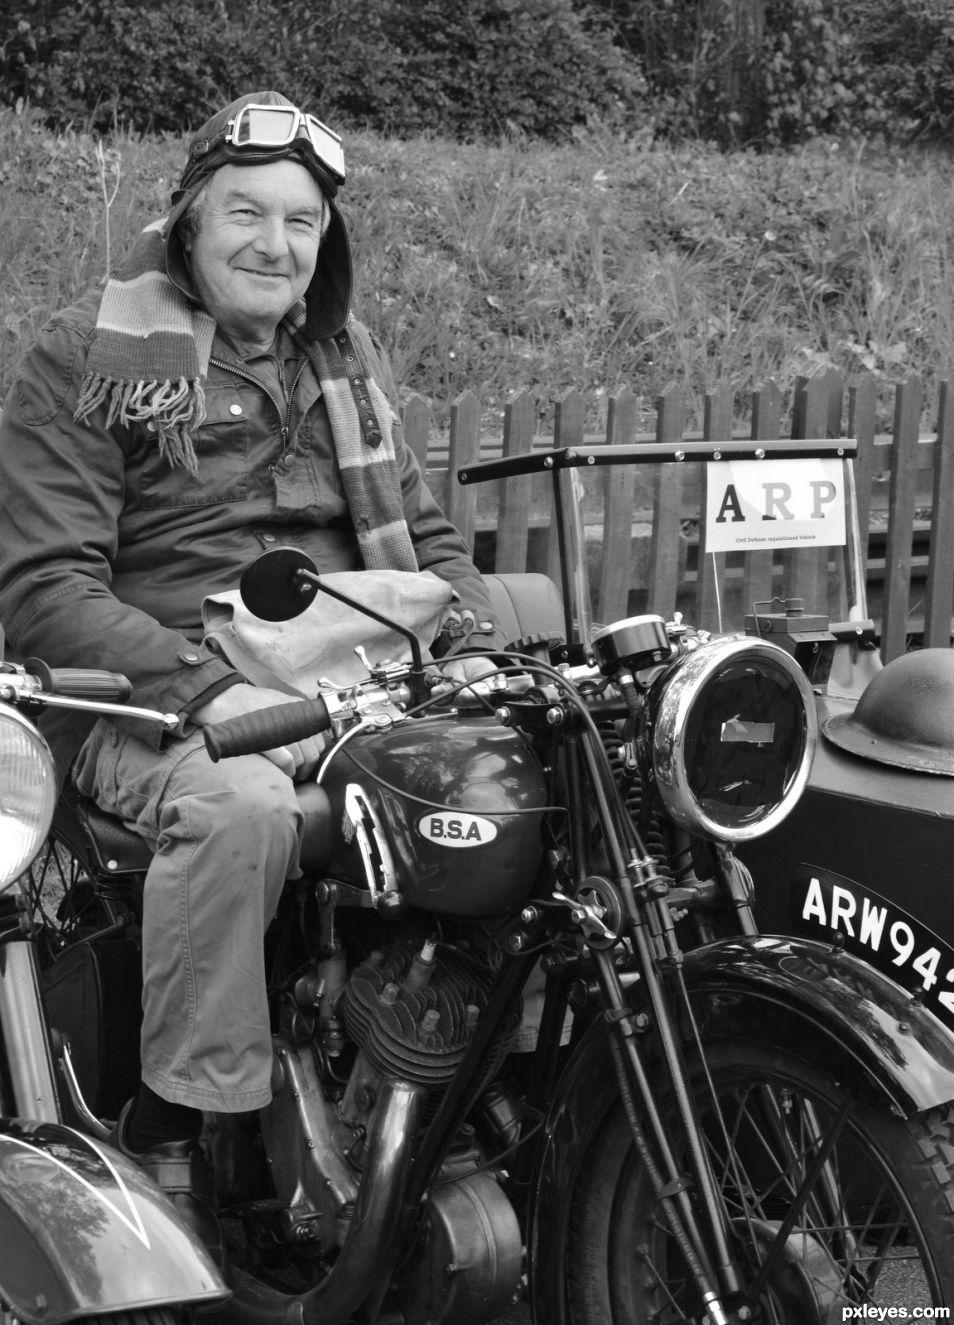 Me and My Motorbike